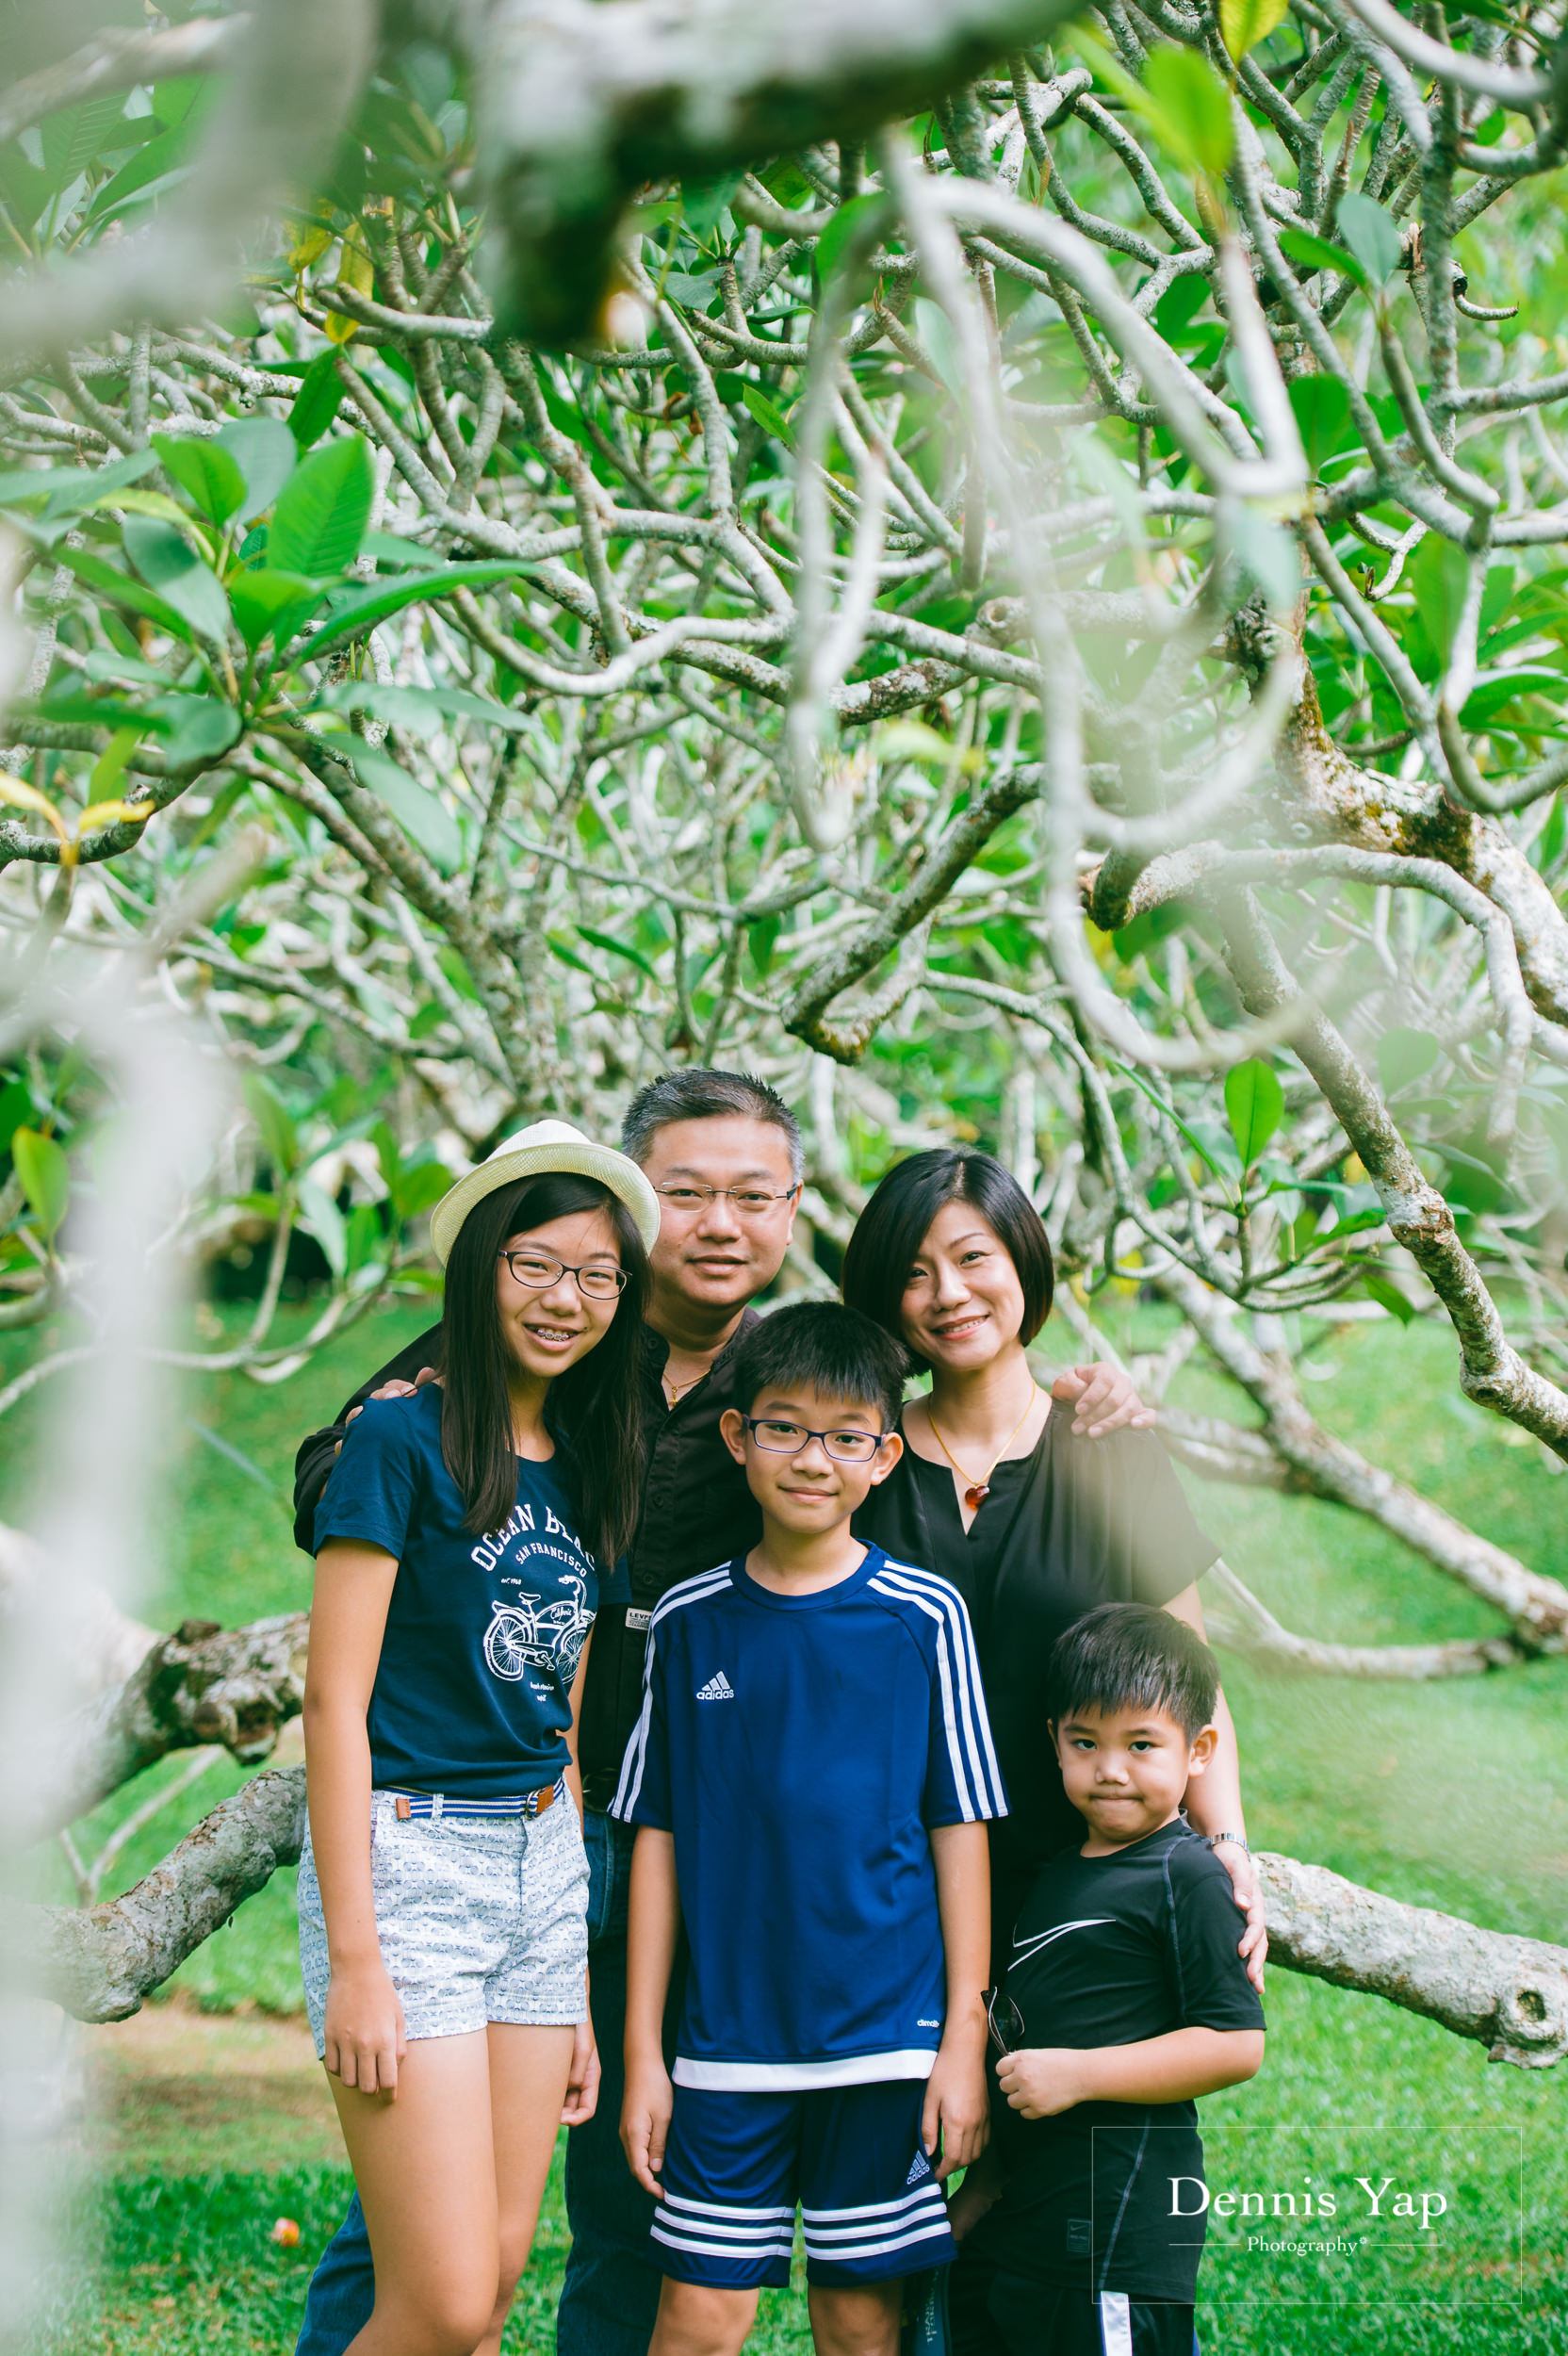 mai yin family portrait singapore botanical garden dennis yap photography malaysia-3.jpg